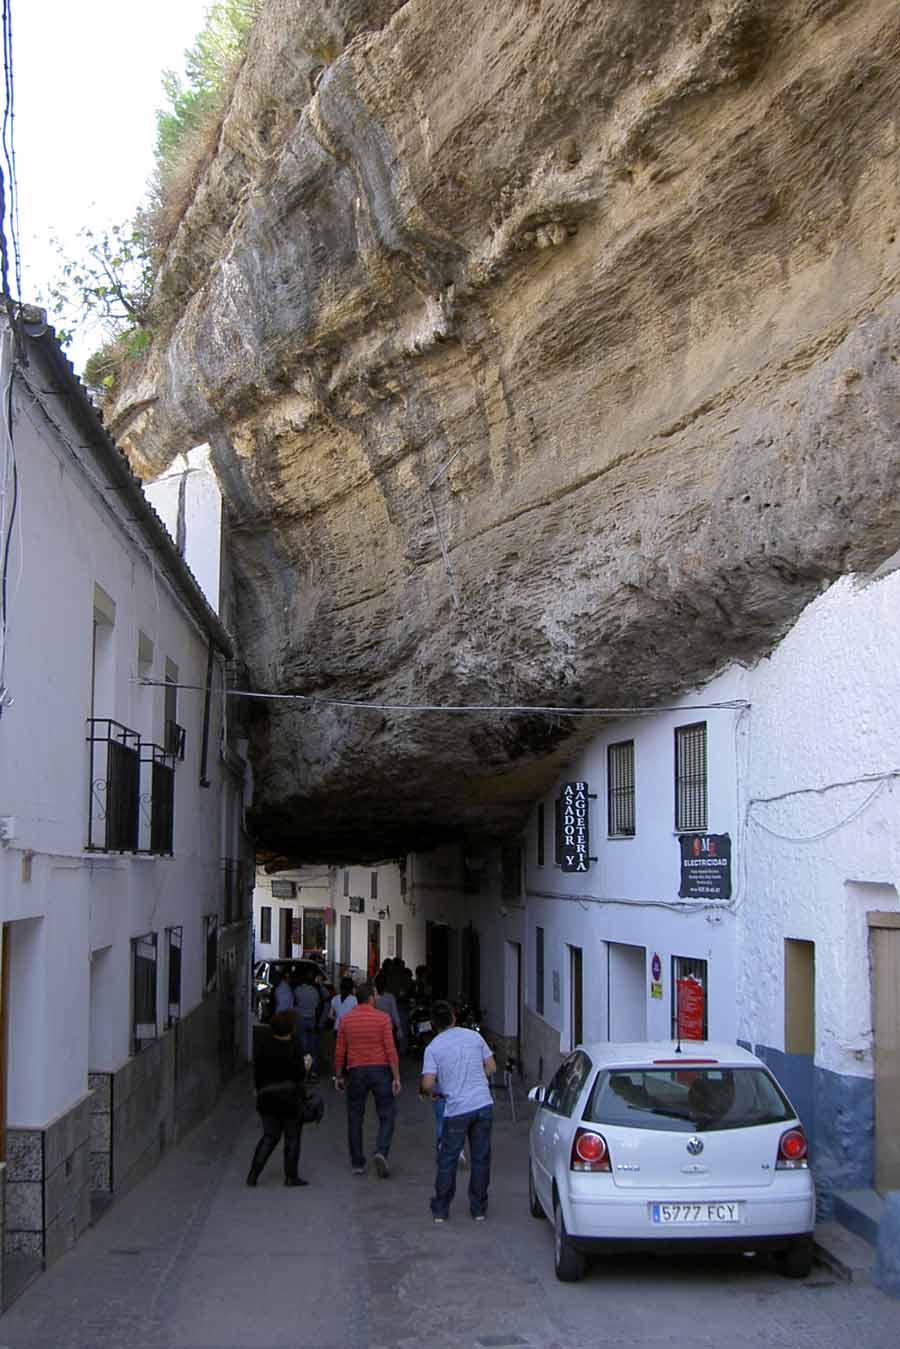 Calle Cuevas de la Sombra, Setenil de las Bodegas